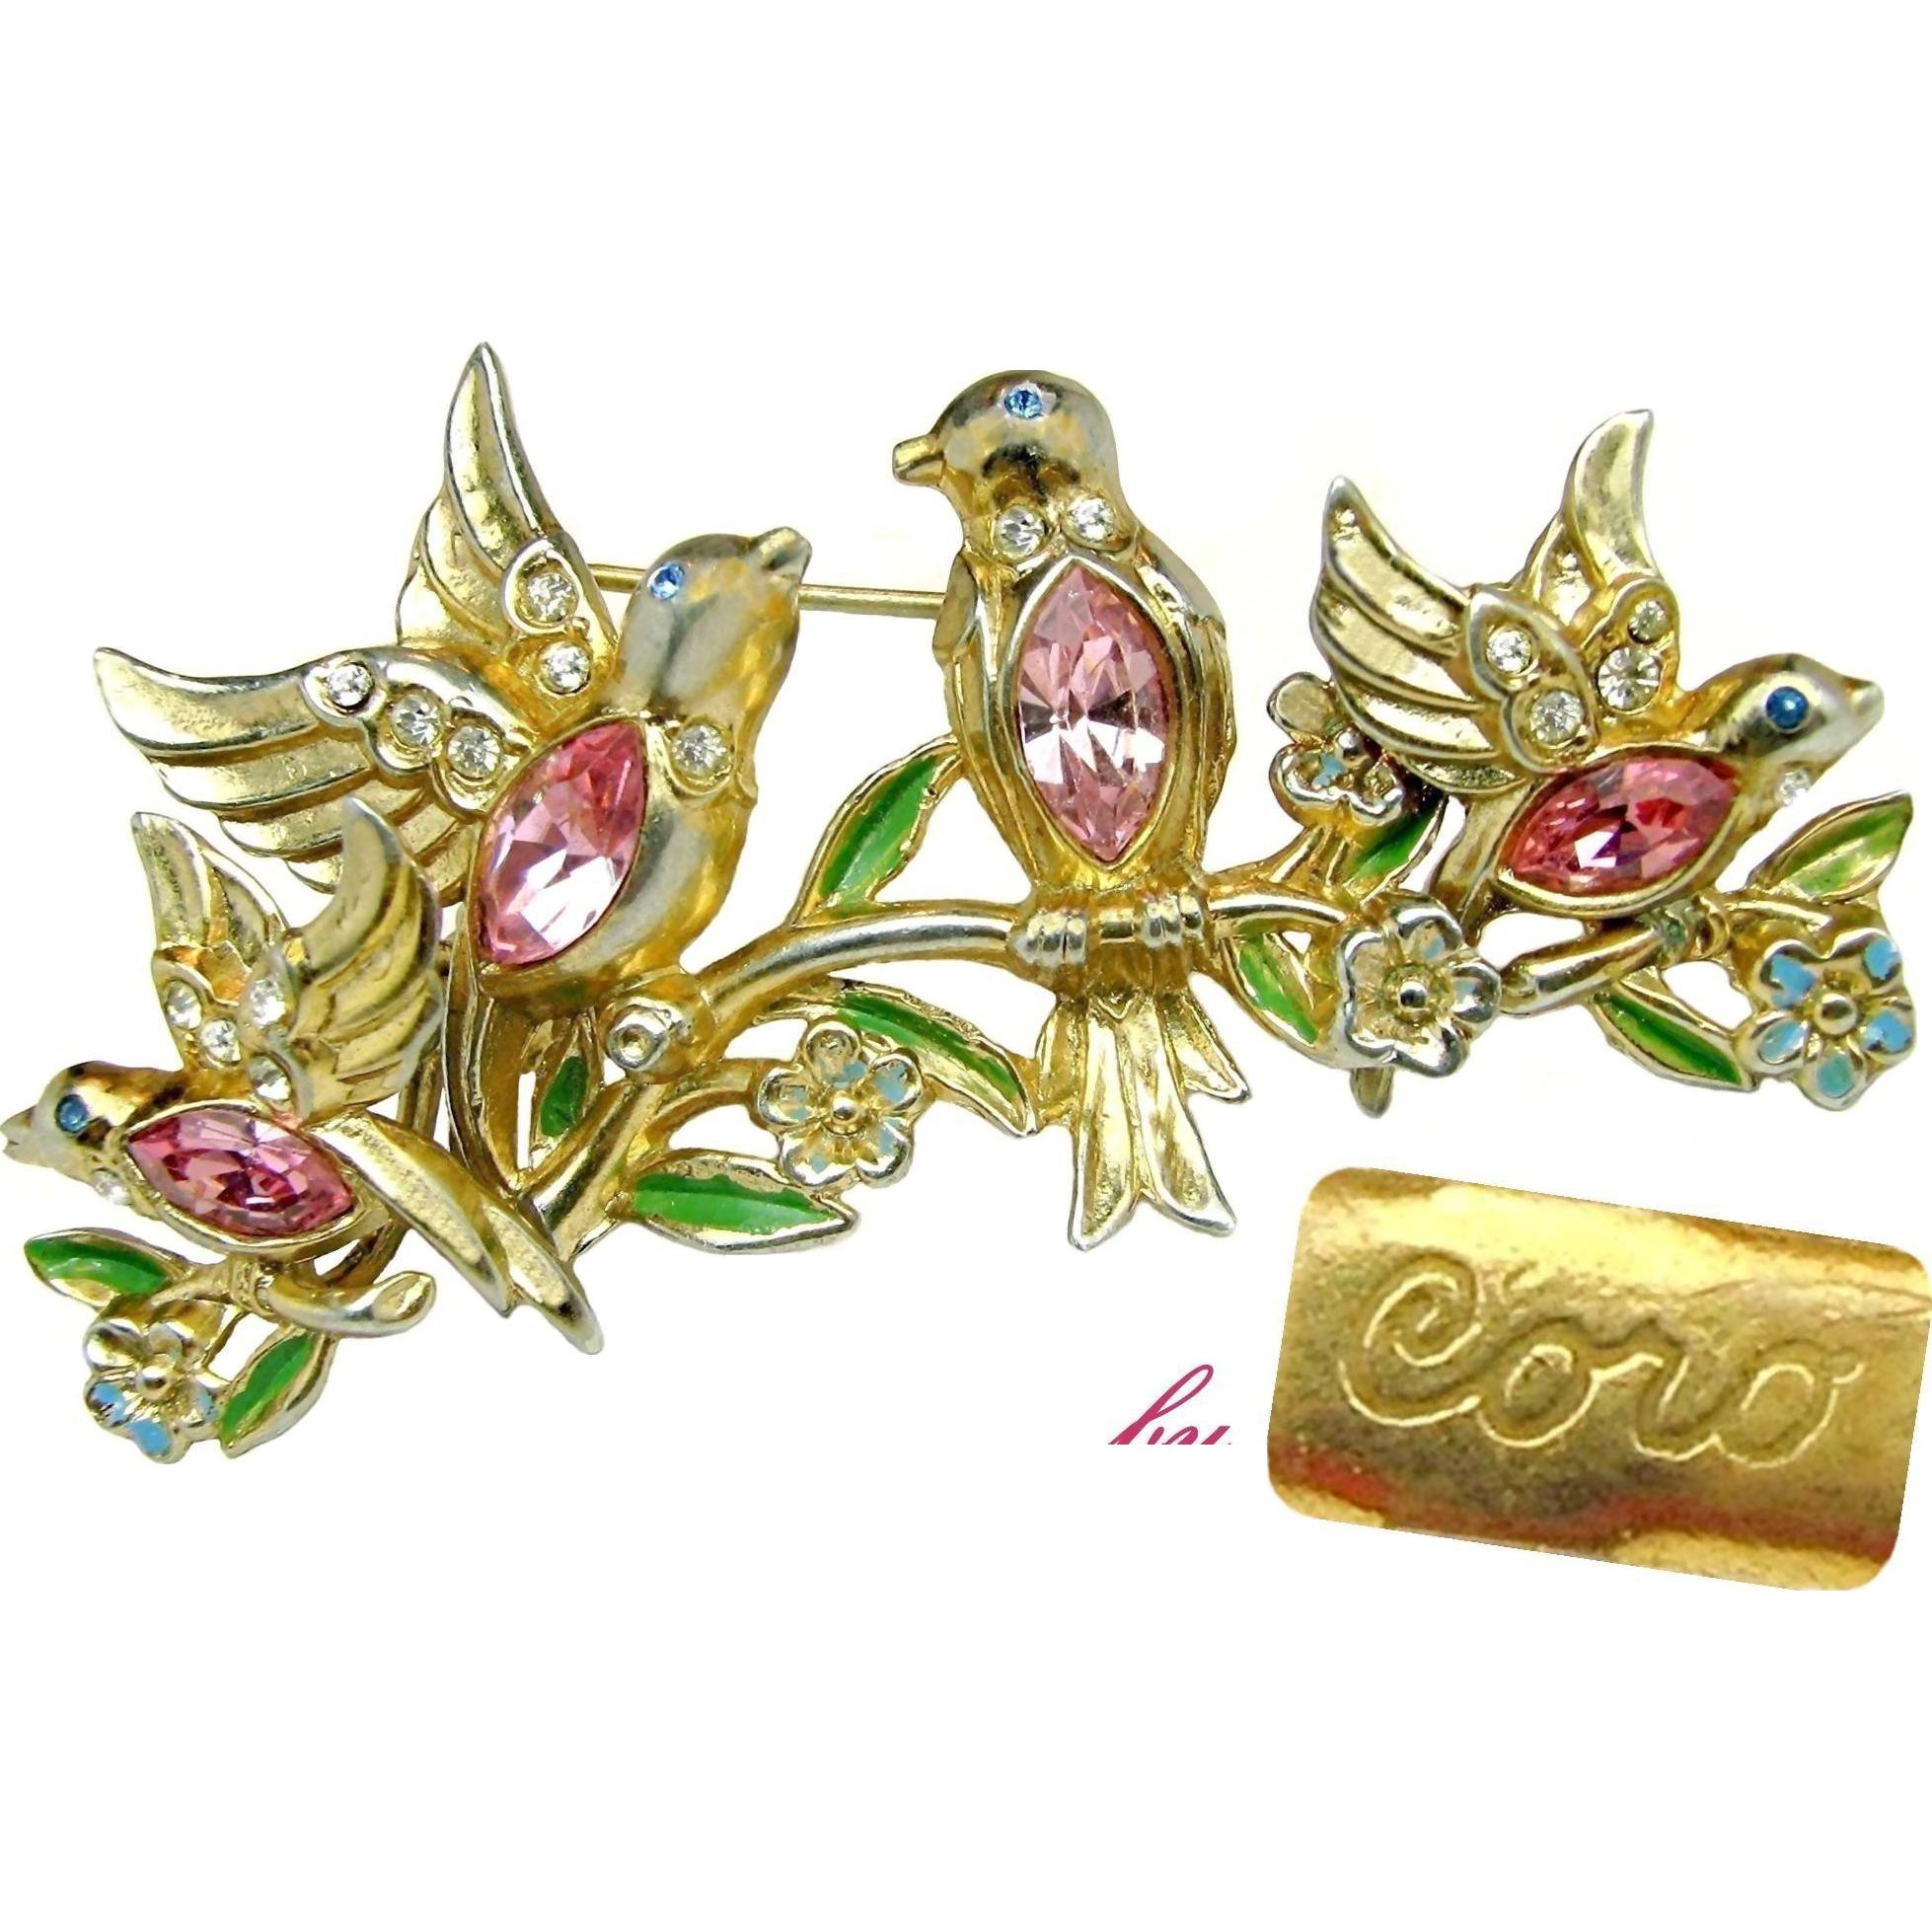 CORO's Pink Rhinestone Bellied BILL & COO Brooch & Earrings Patented c.1948